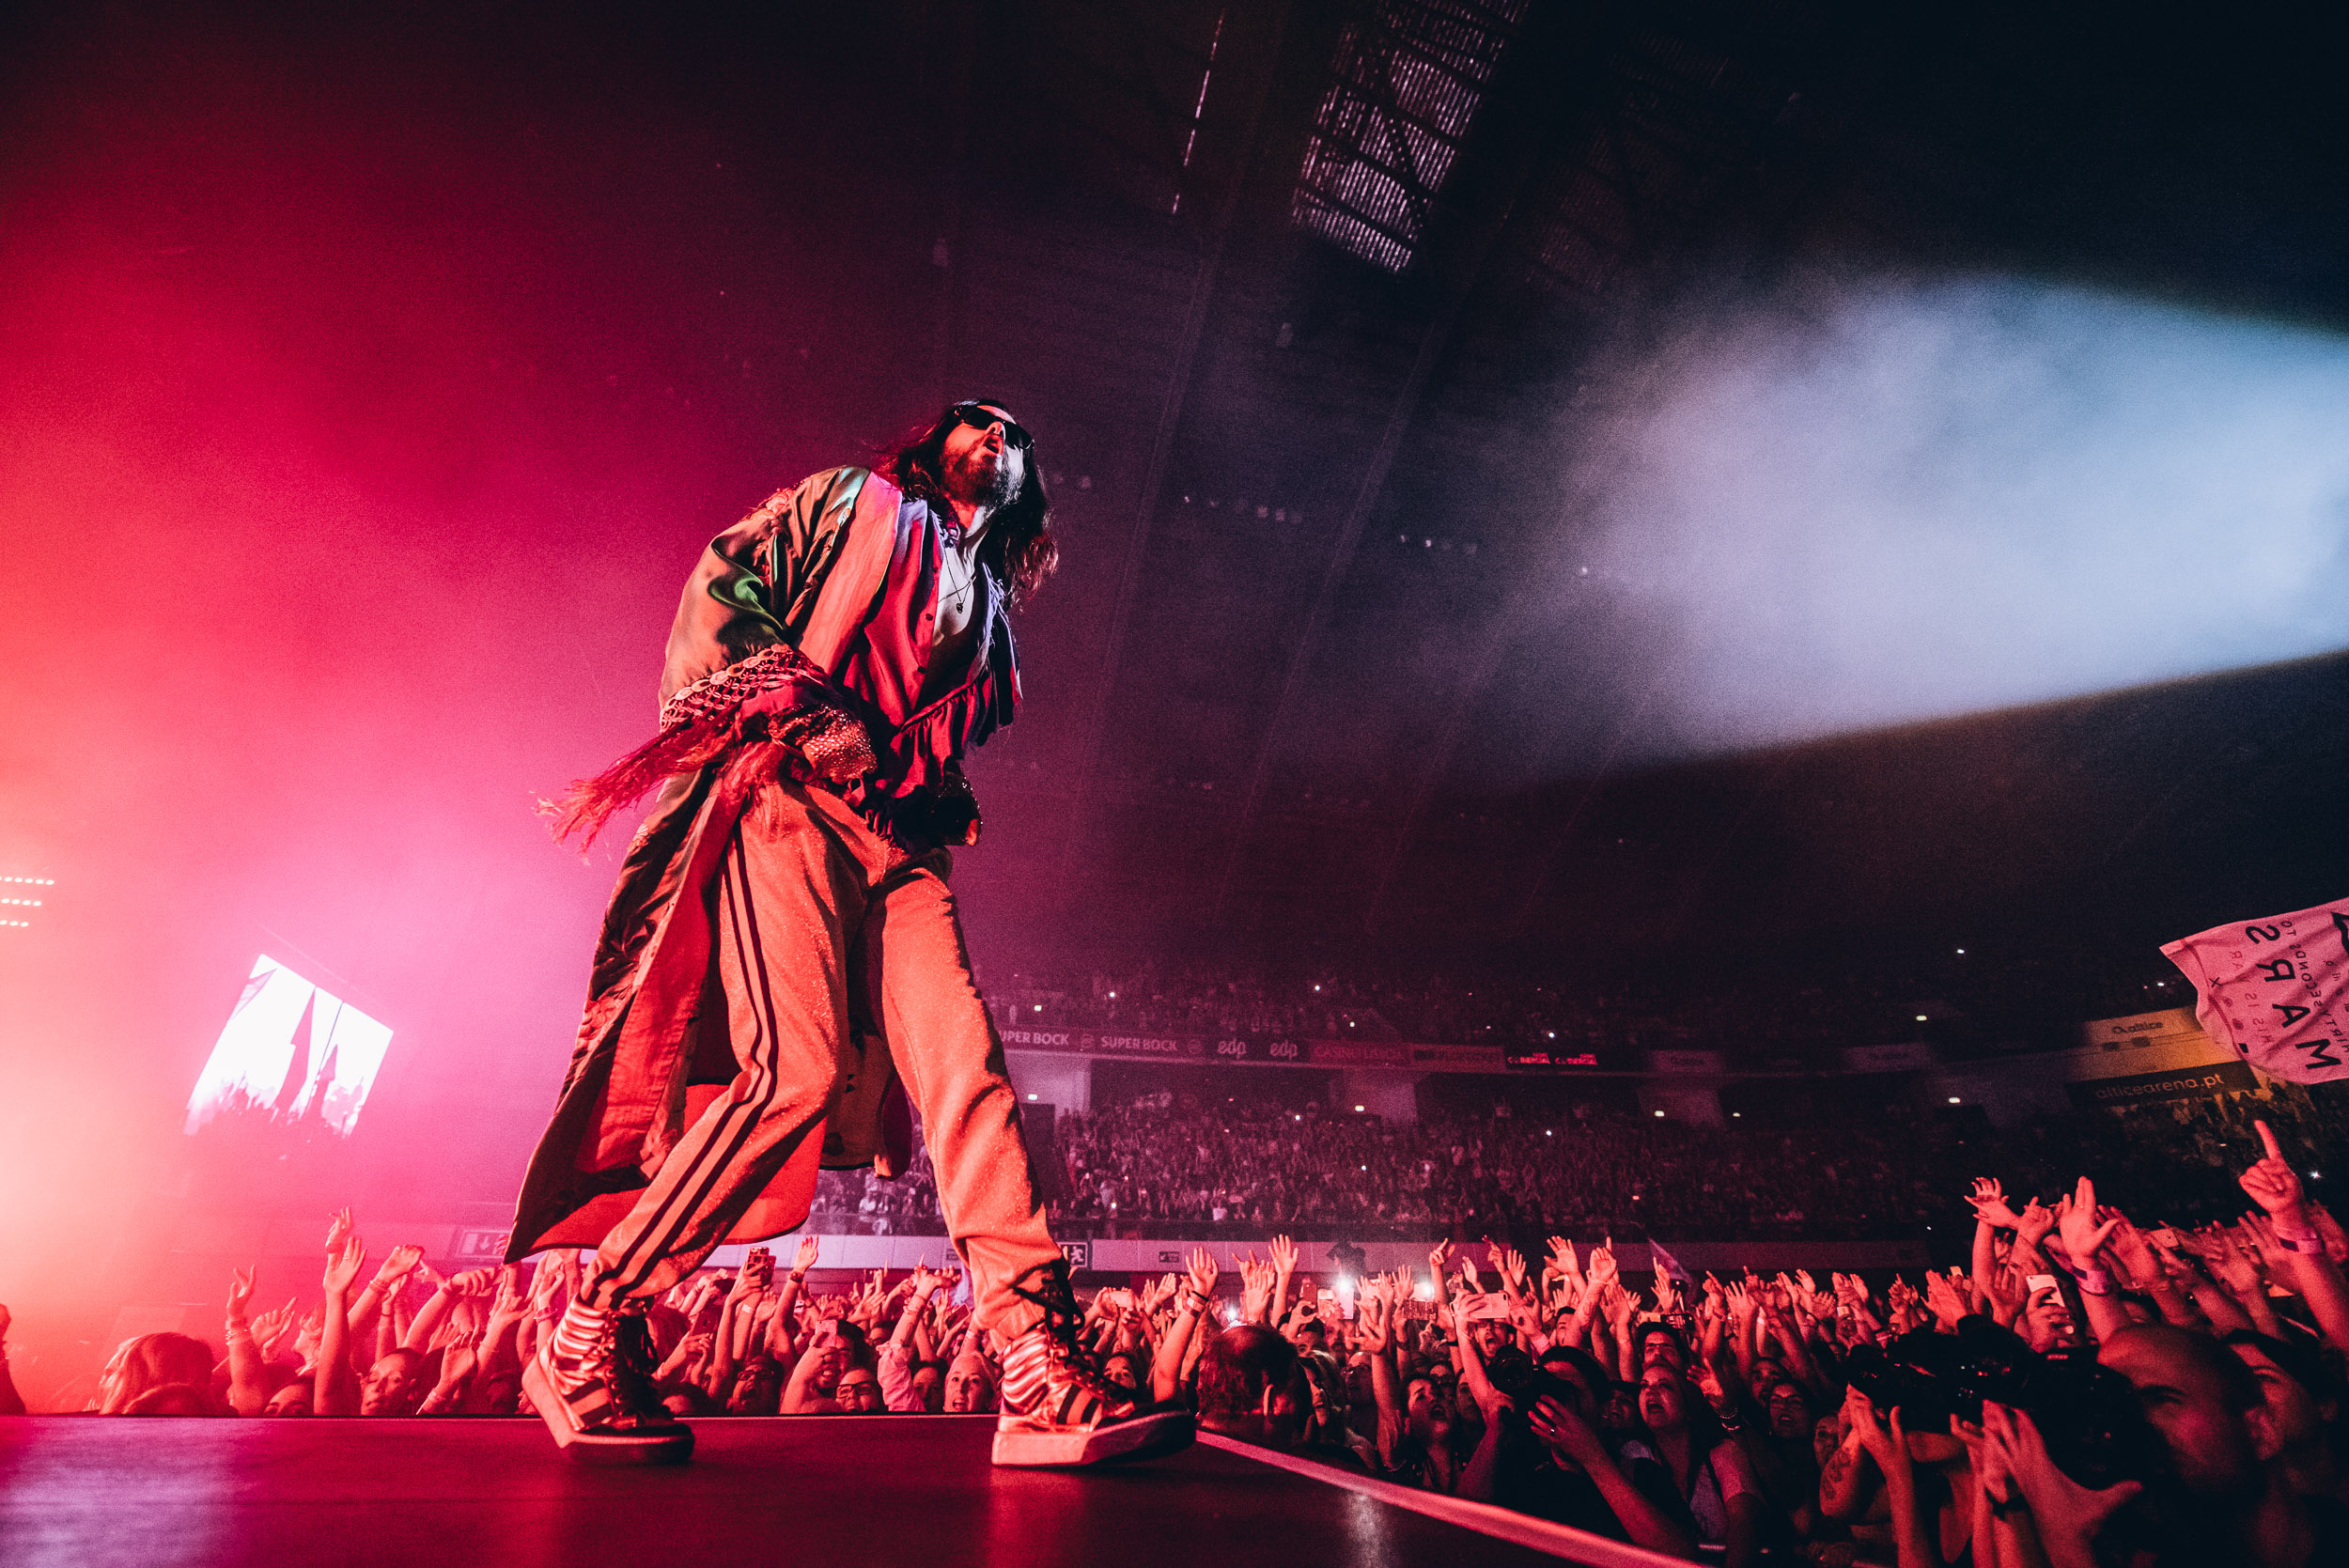 30 Seconds to Mars Altice Arena 20180912-268.jpg